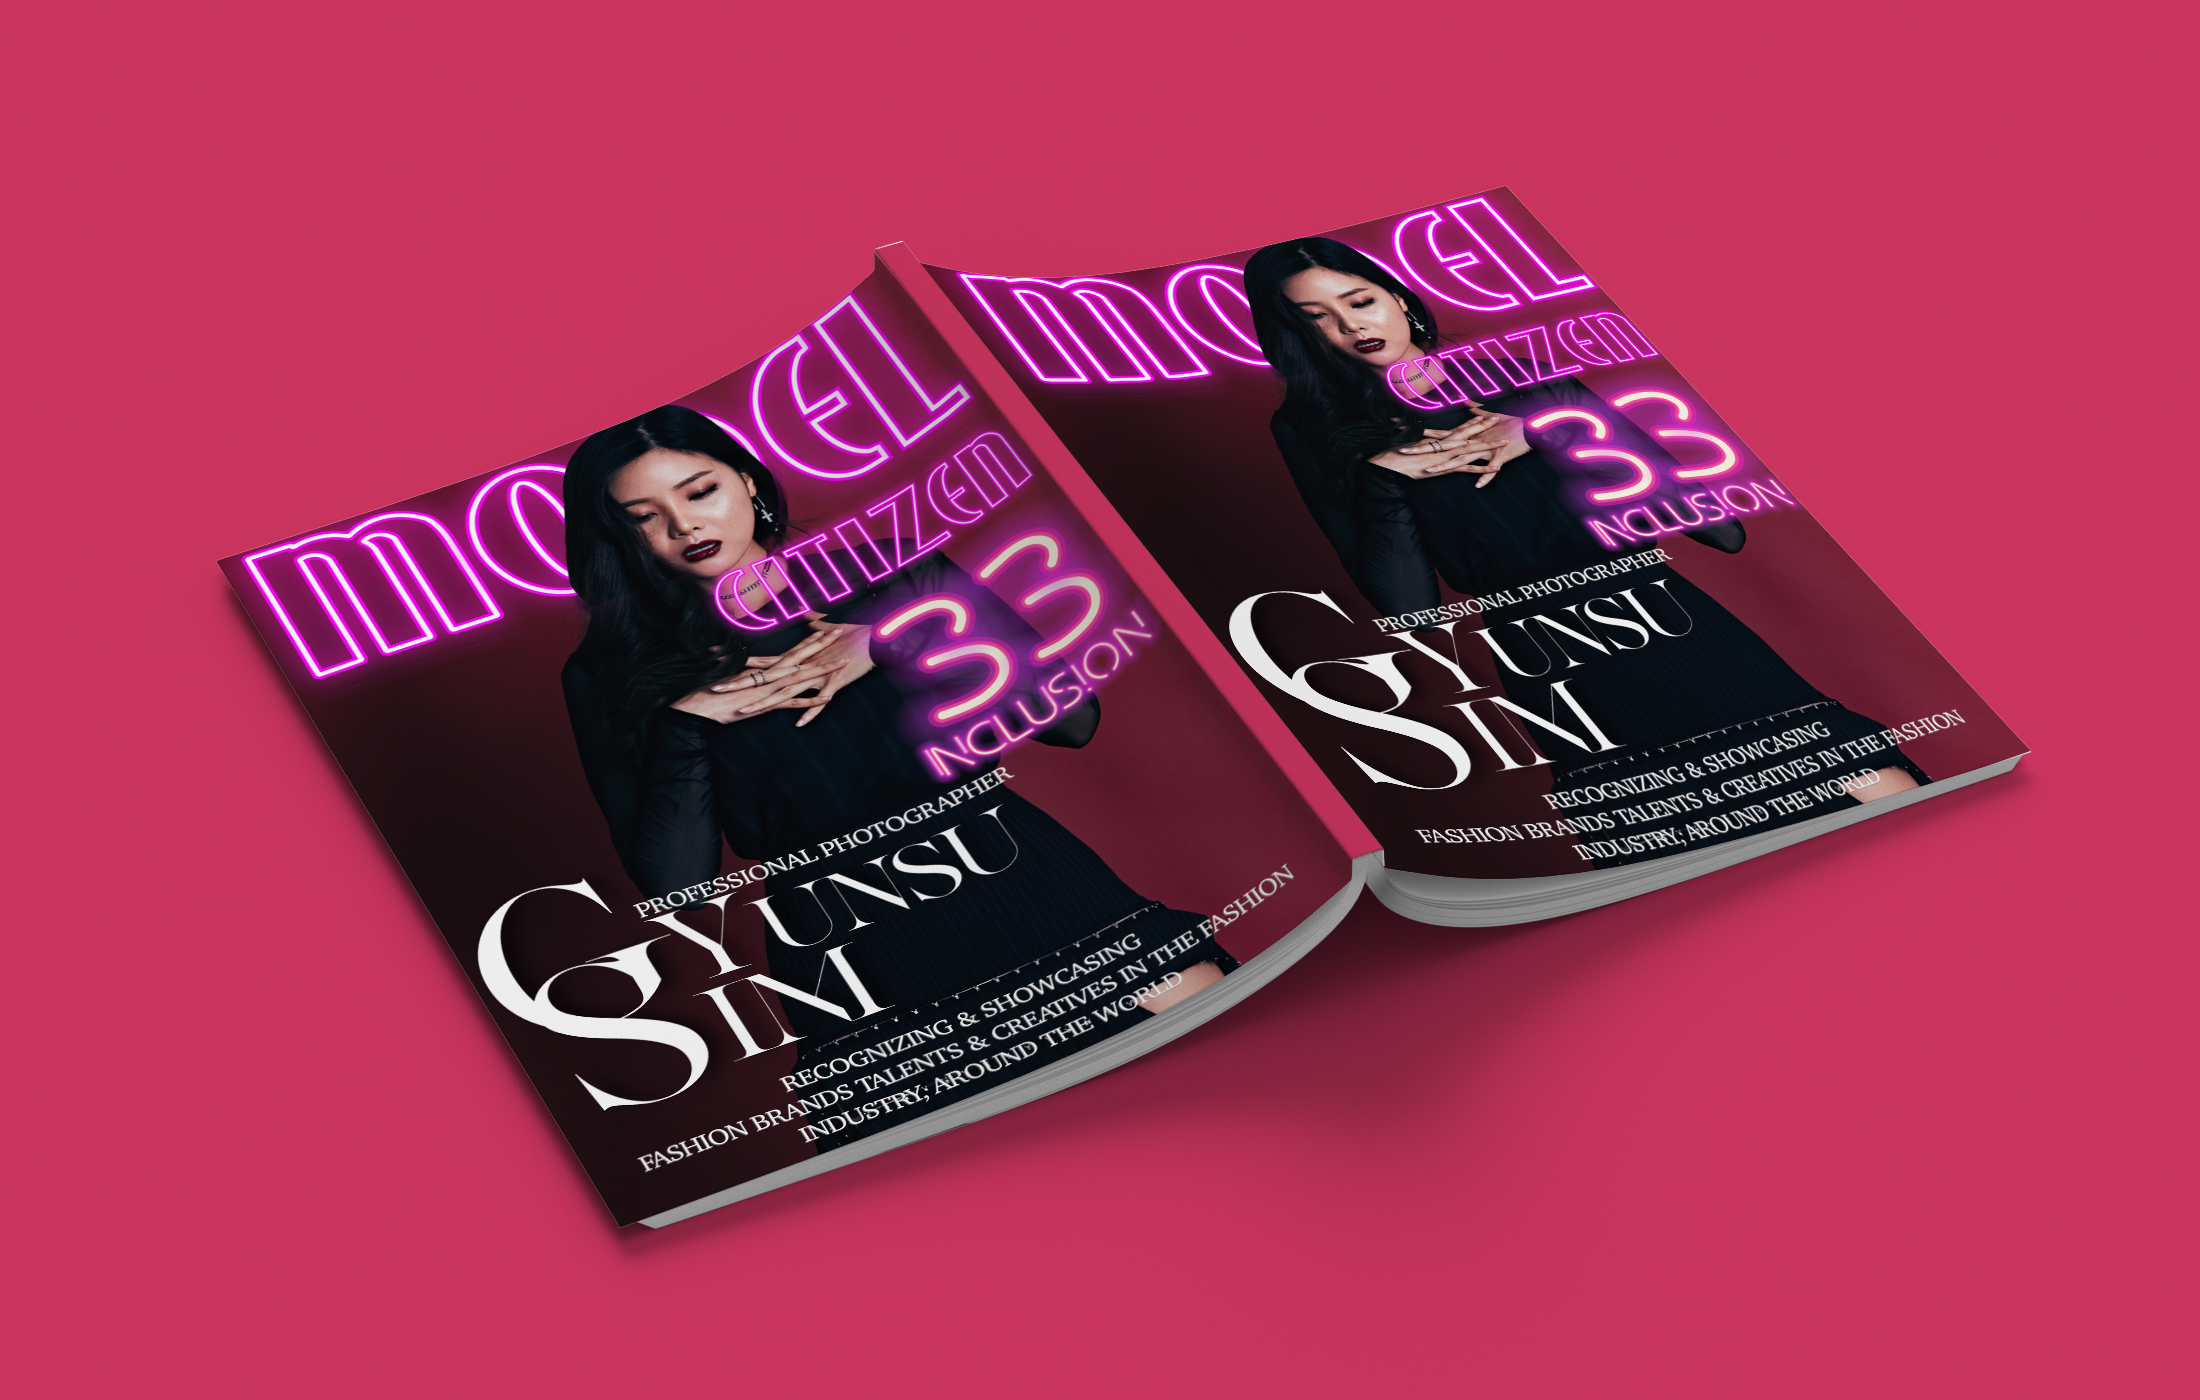 Model Citizen Magazine Issue 33, Macky Suson, Fashion Inclusion Now2.png